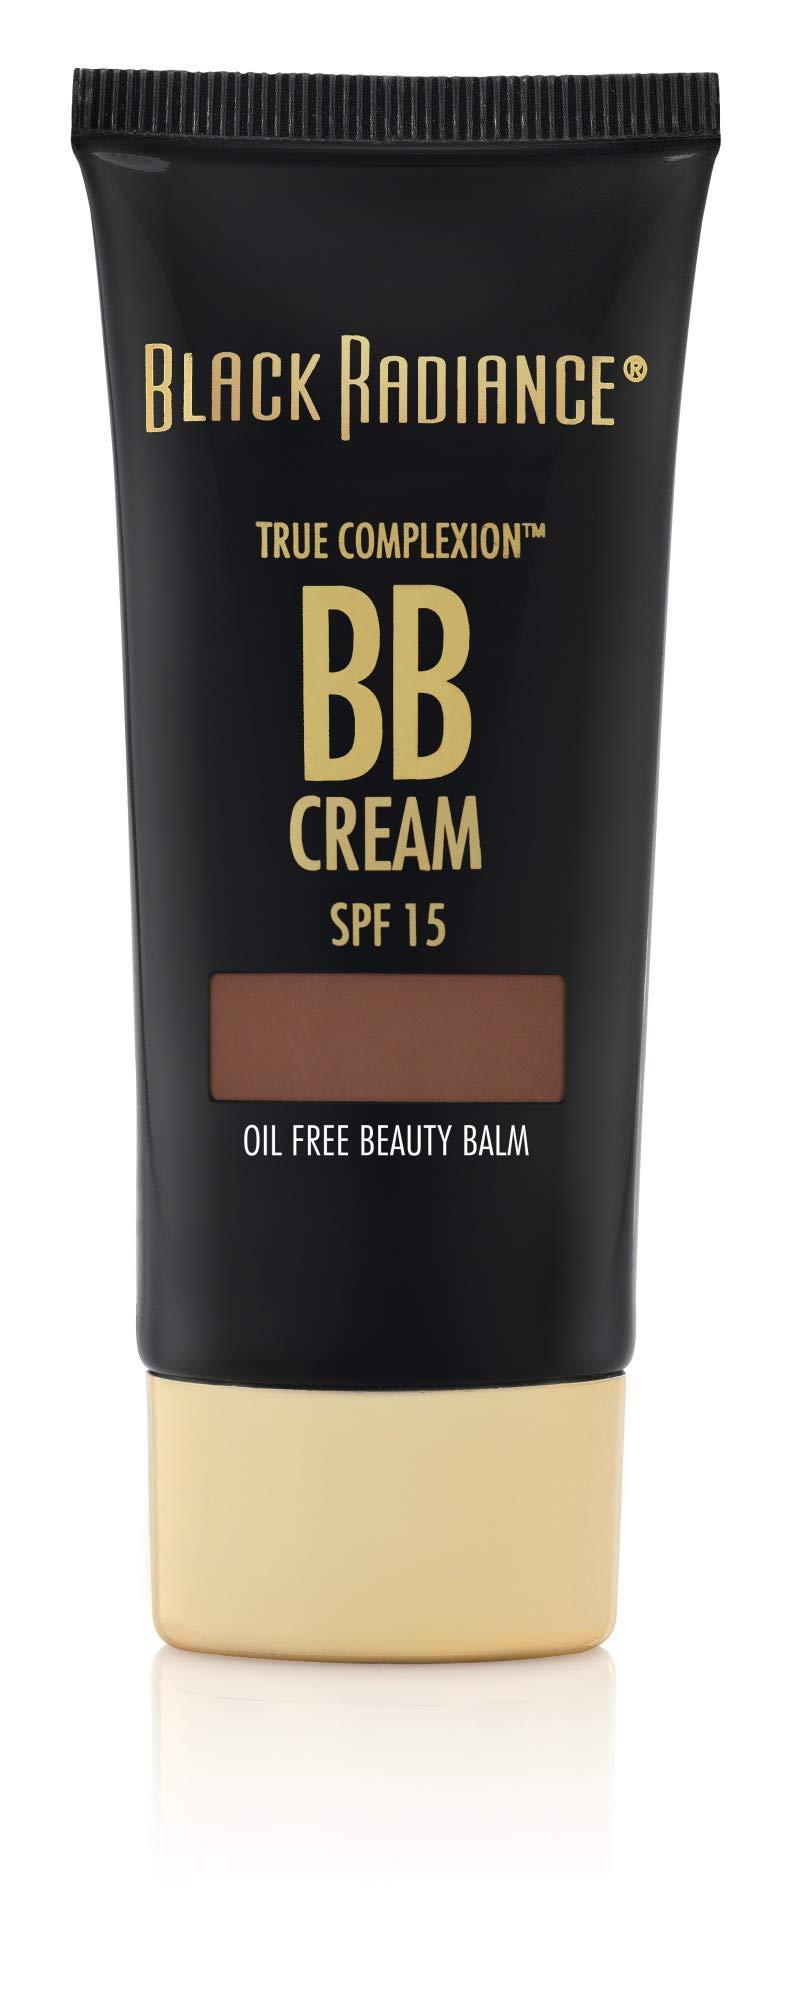 Black Radiance True Complexion Bb Cream SPF 15, Chocolate, 1 Ounce